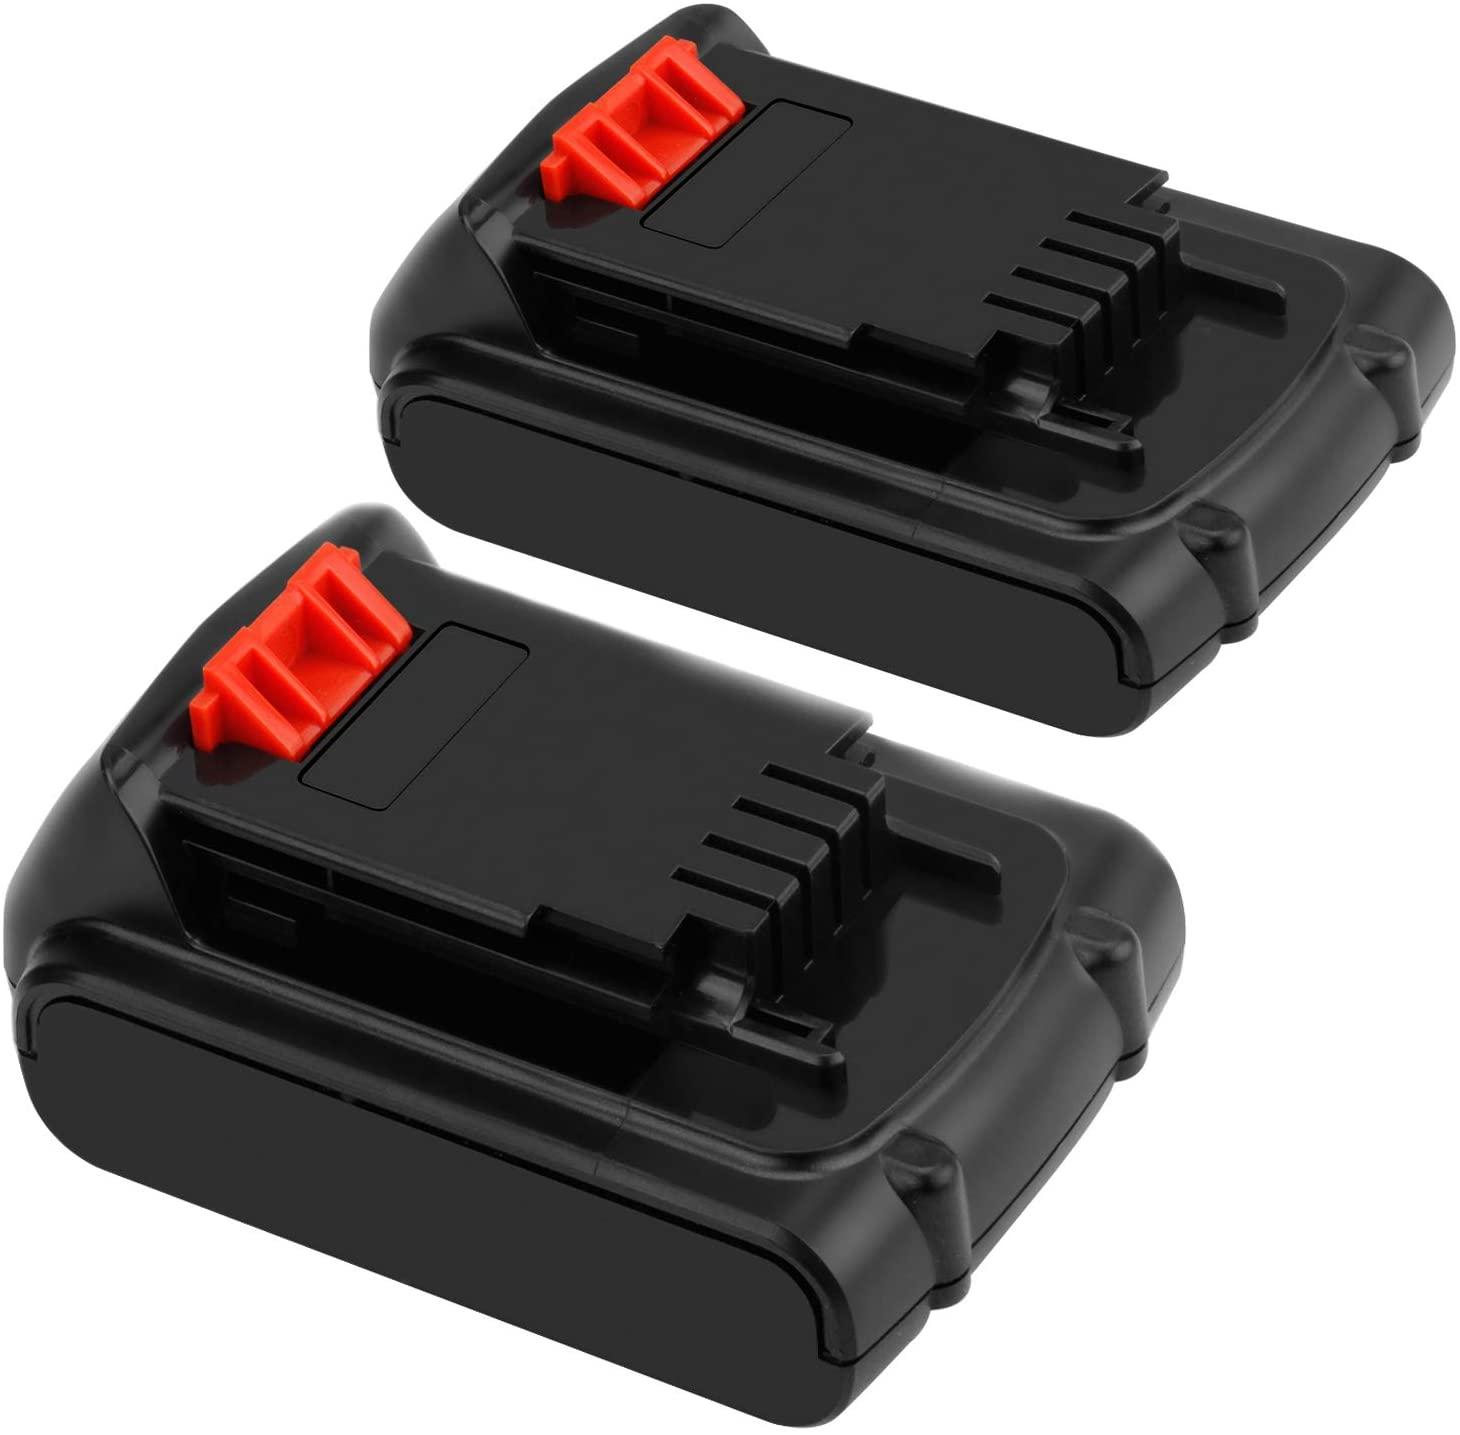 Creabest 20v 2500mAh Lithium-Ion for Black & Decker lbxr20 battery LBXR LBXR20 LBX20 LB20 LBXR2020-OPE LBXR20B-2 LB2X4020-2 LBX4020 LDX120 LSW20 LHT2220 LST220 LLP120